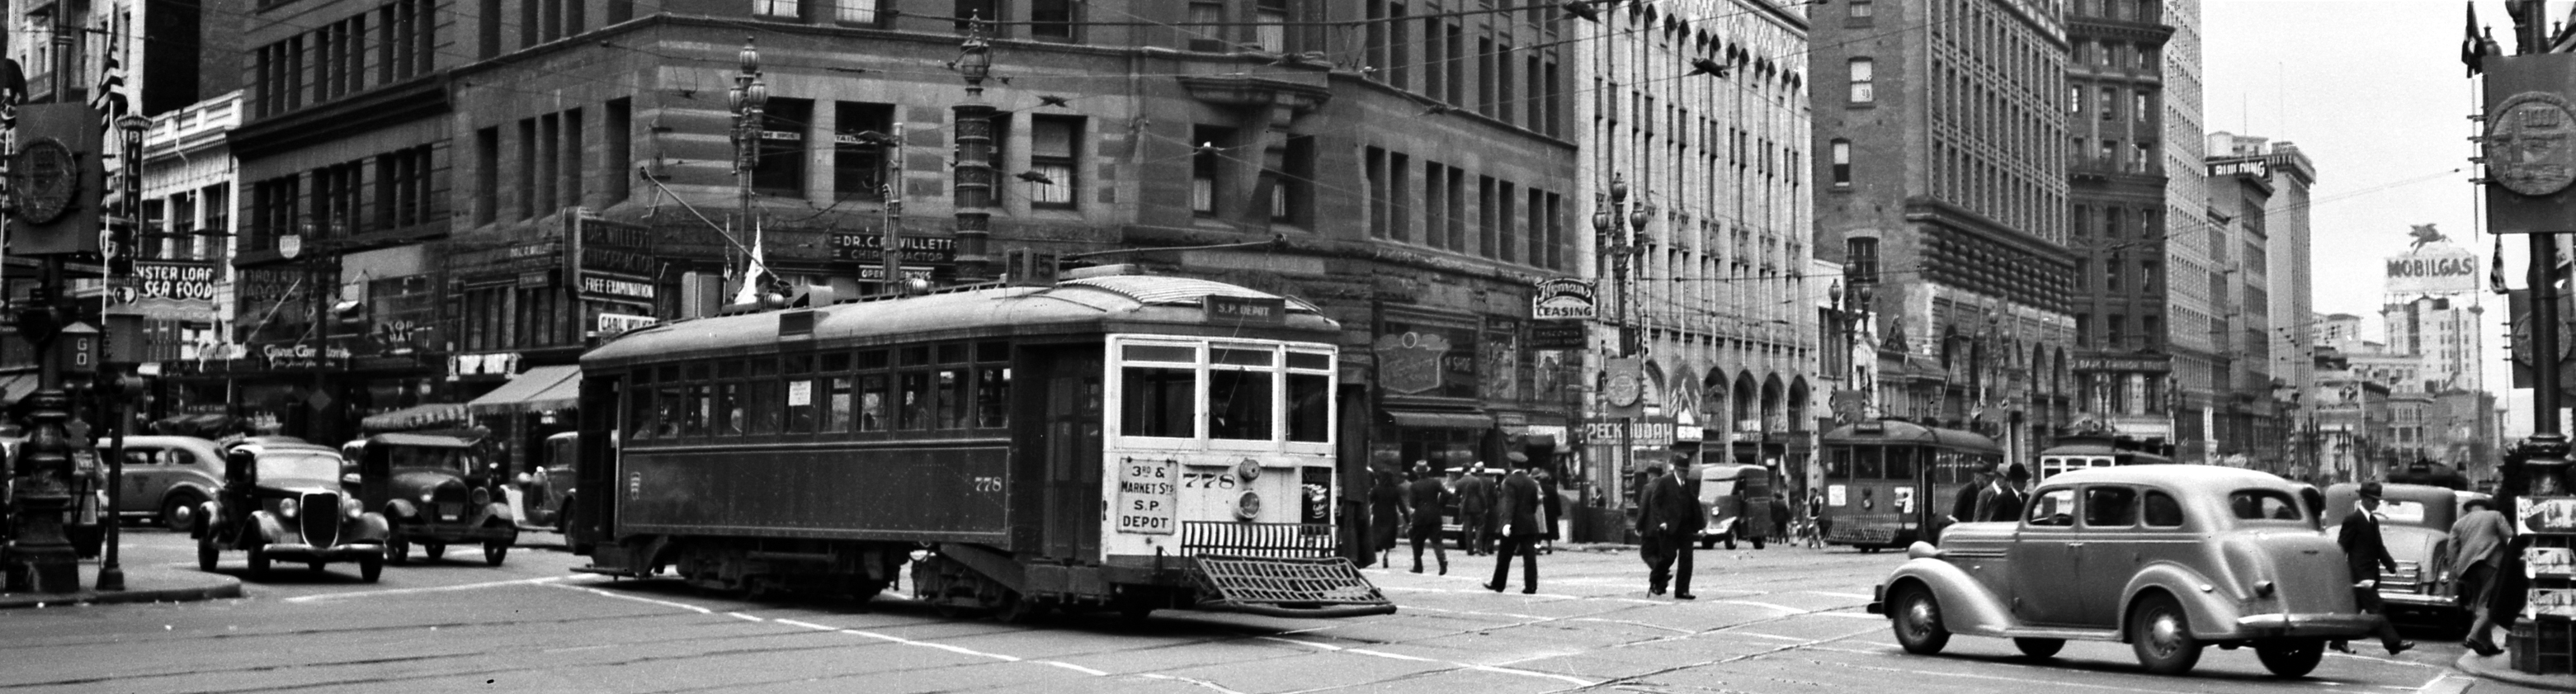 third-and-market-1939http-kellistanley.com